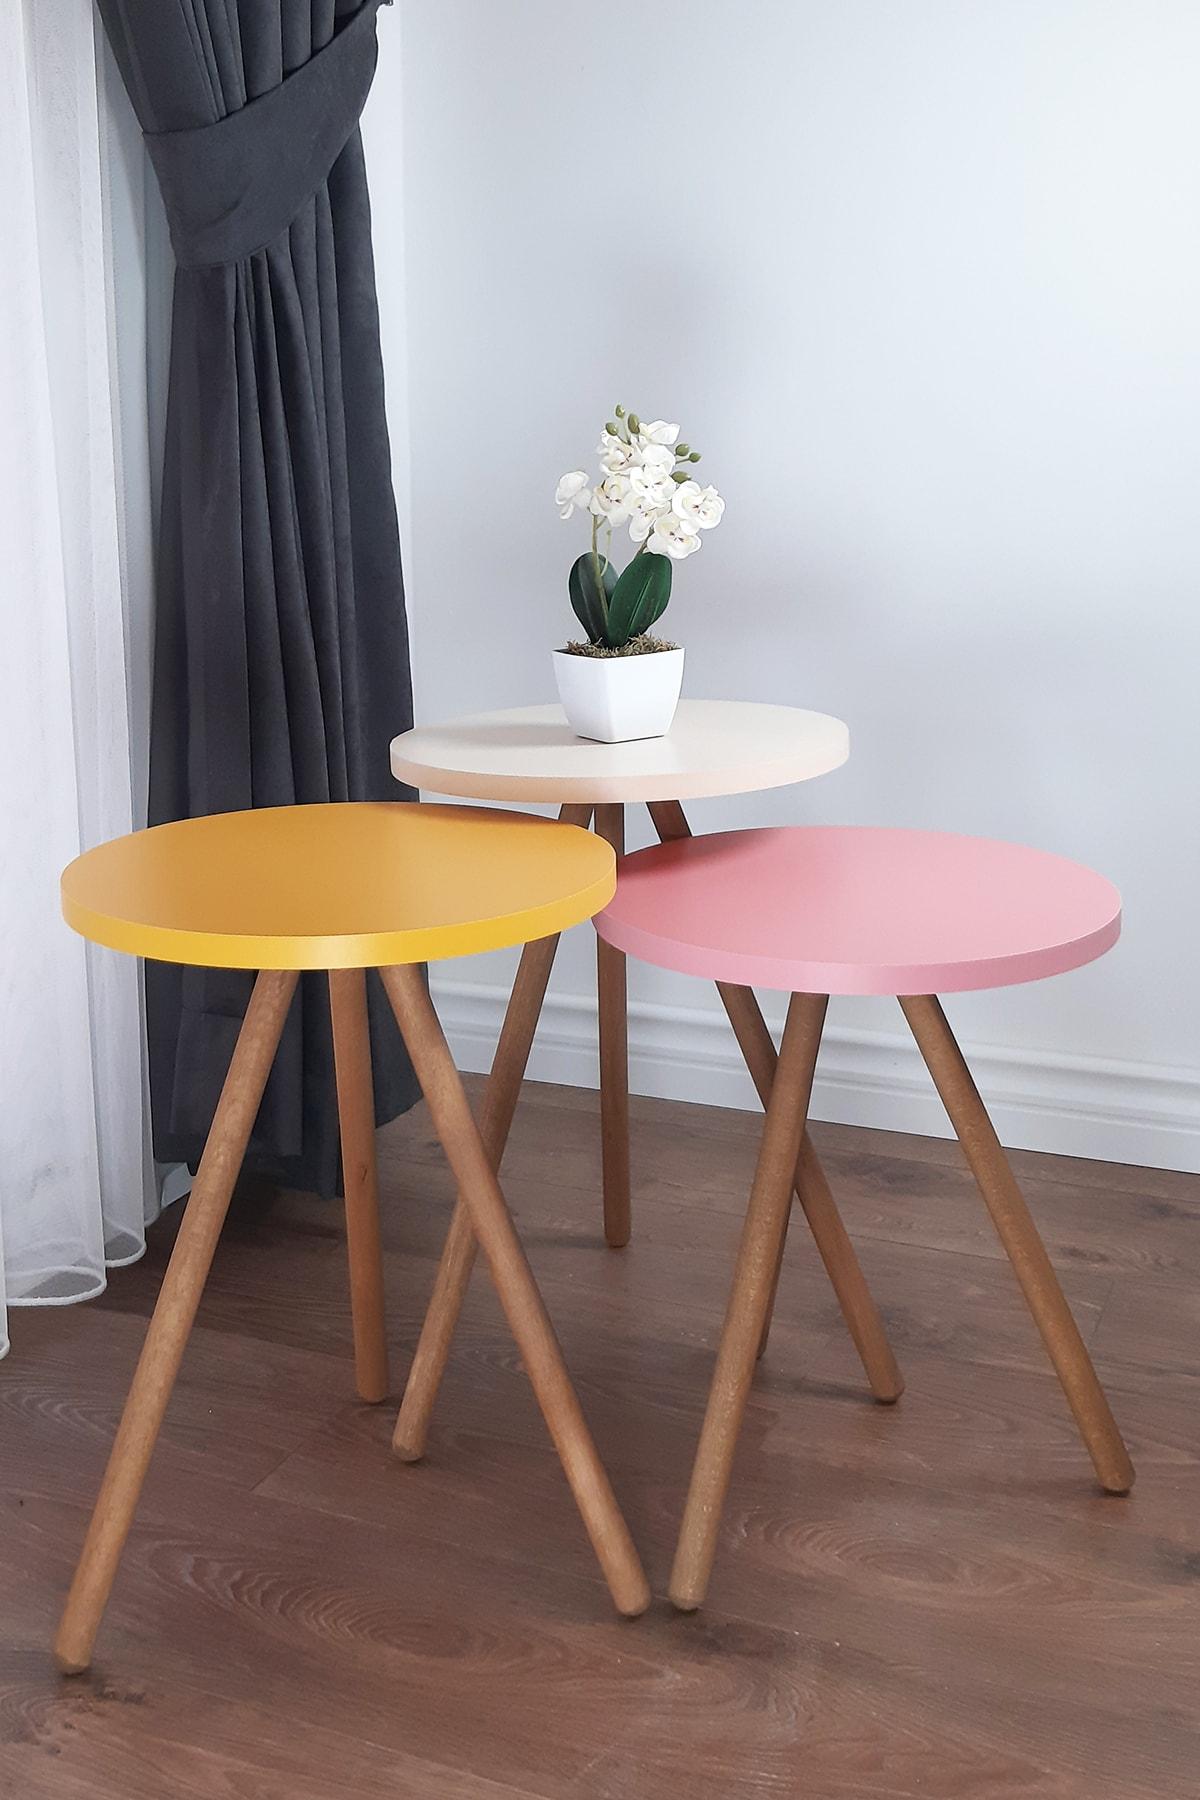 Renkli Üçlü Zigon Sehpa Ahşap Ayaklı Yuvarlak Pastel Tasarım - Sarı Krem Pembe